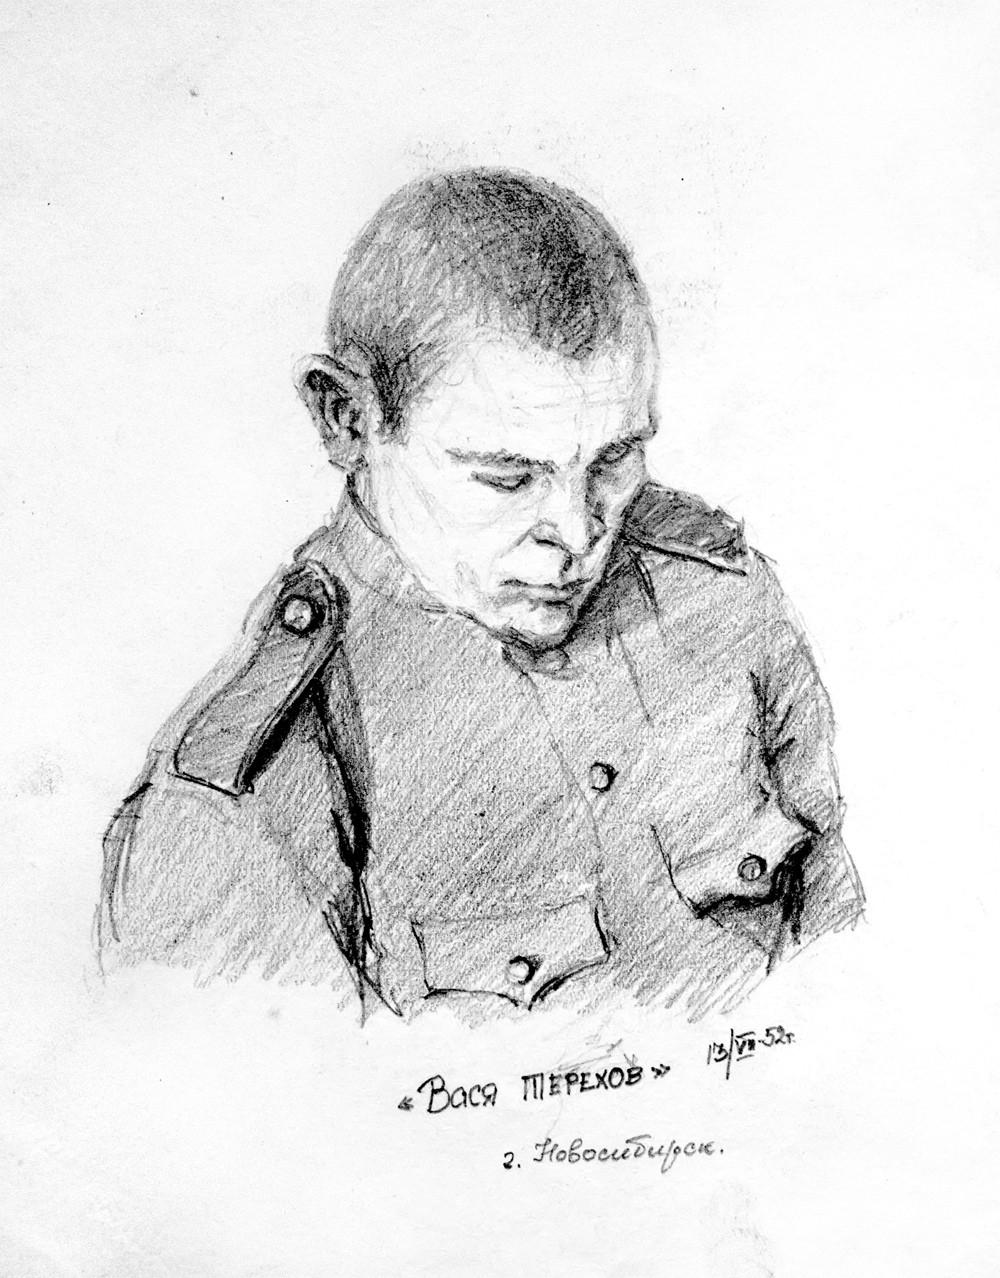 Василий Терехов СИГ